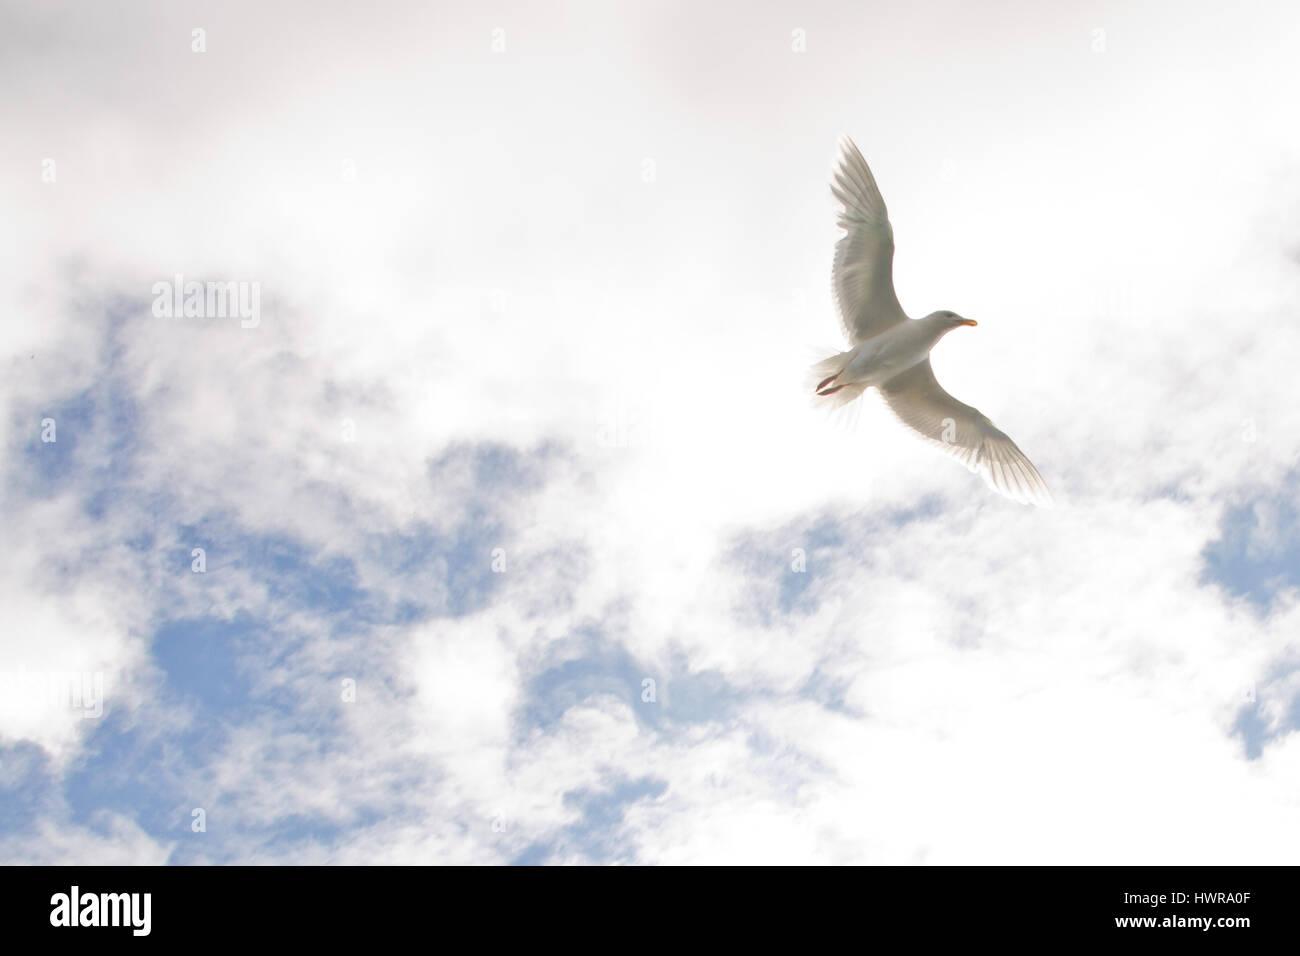 Arctic bird flying in the sky - Stock Image